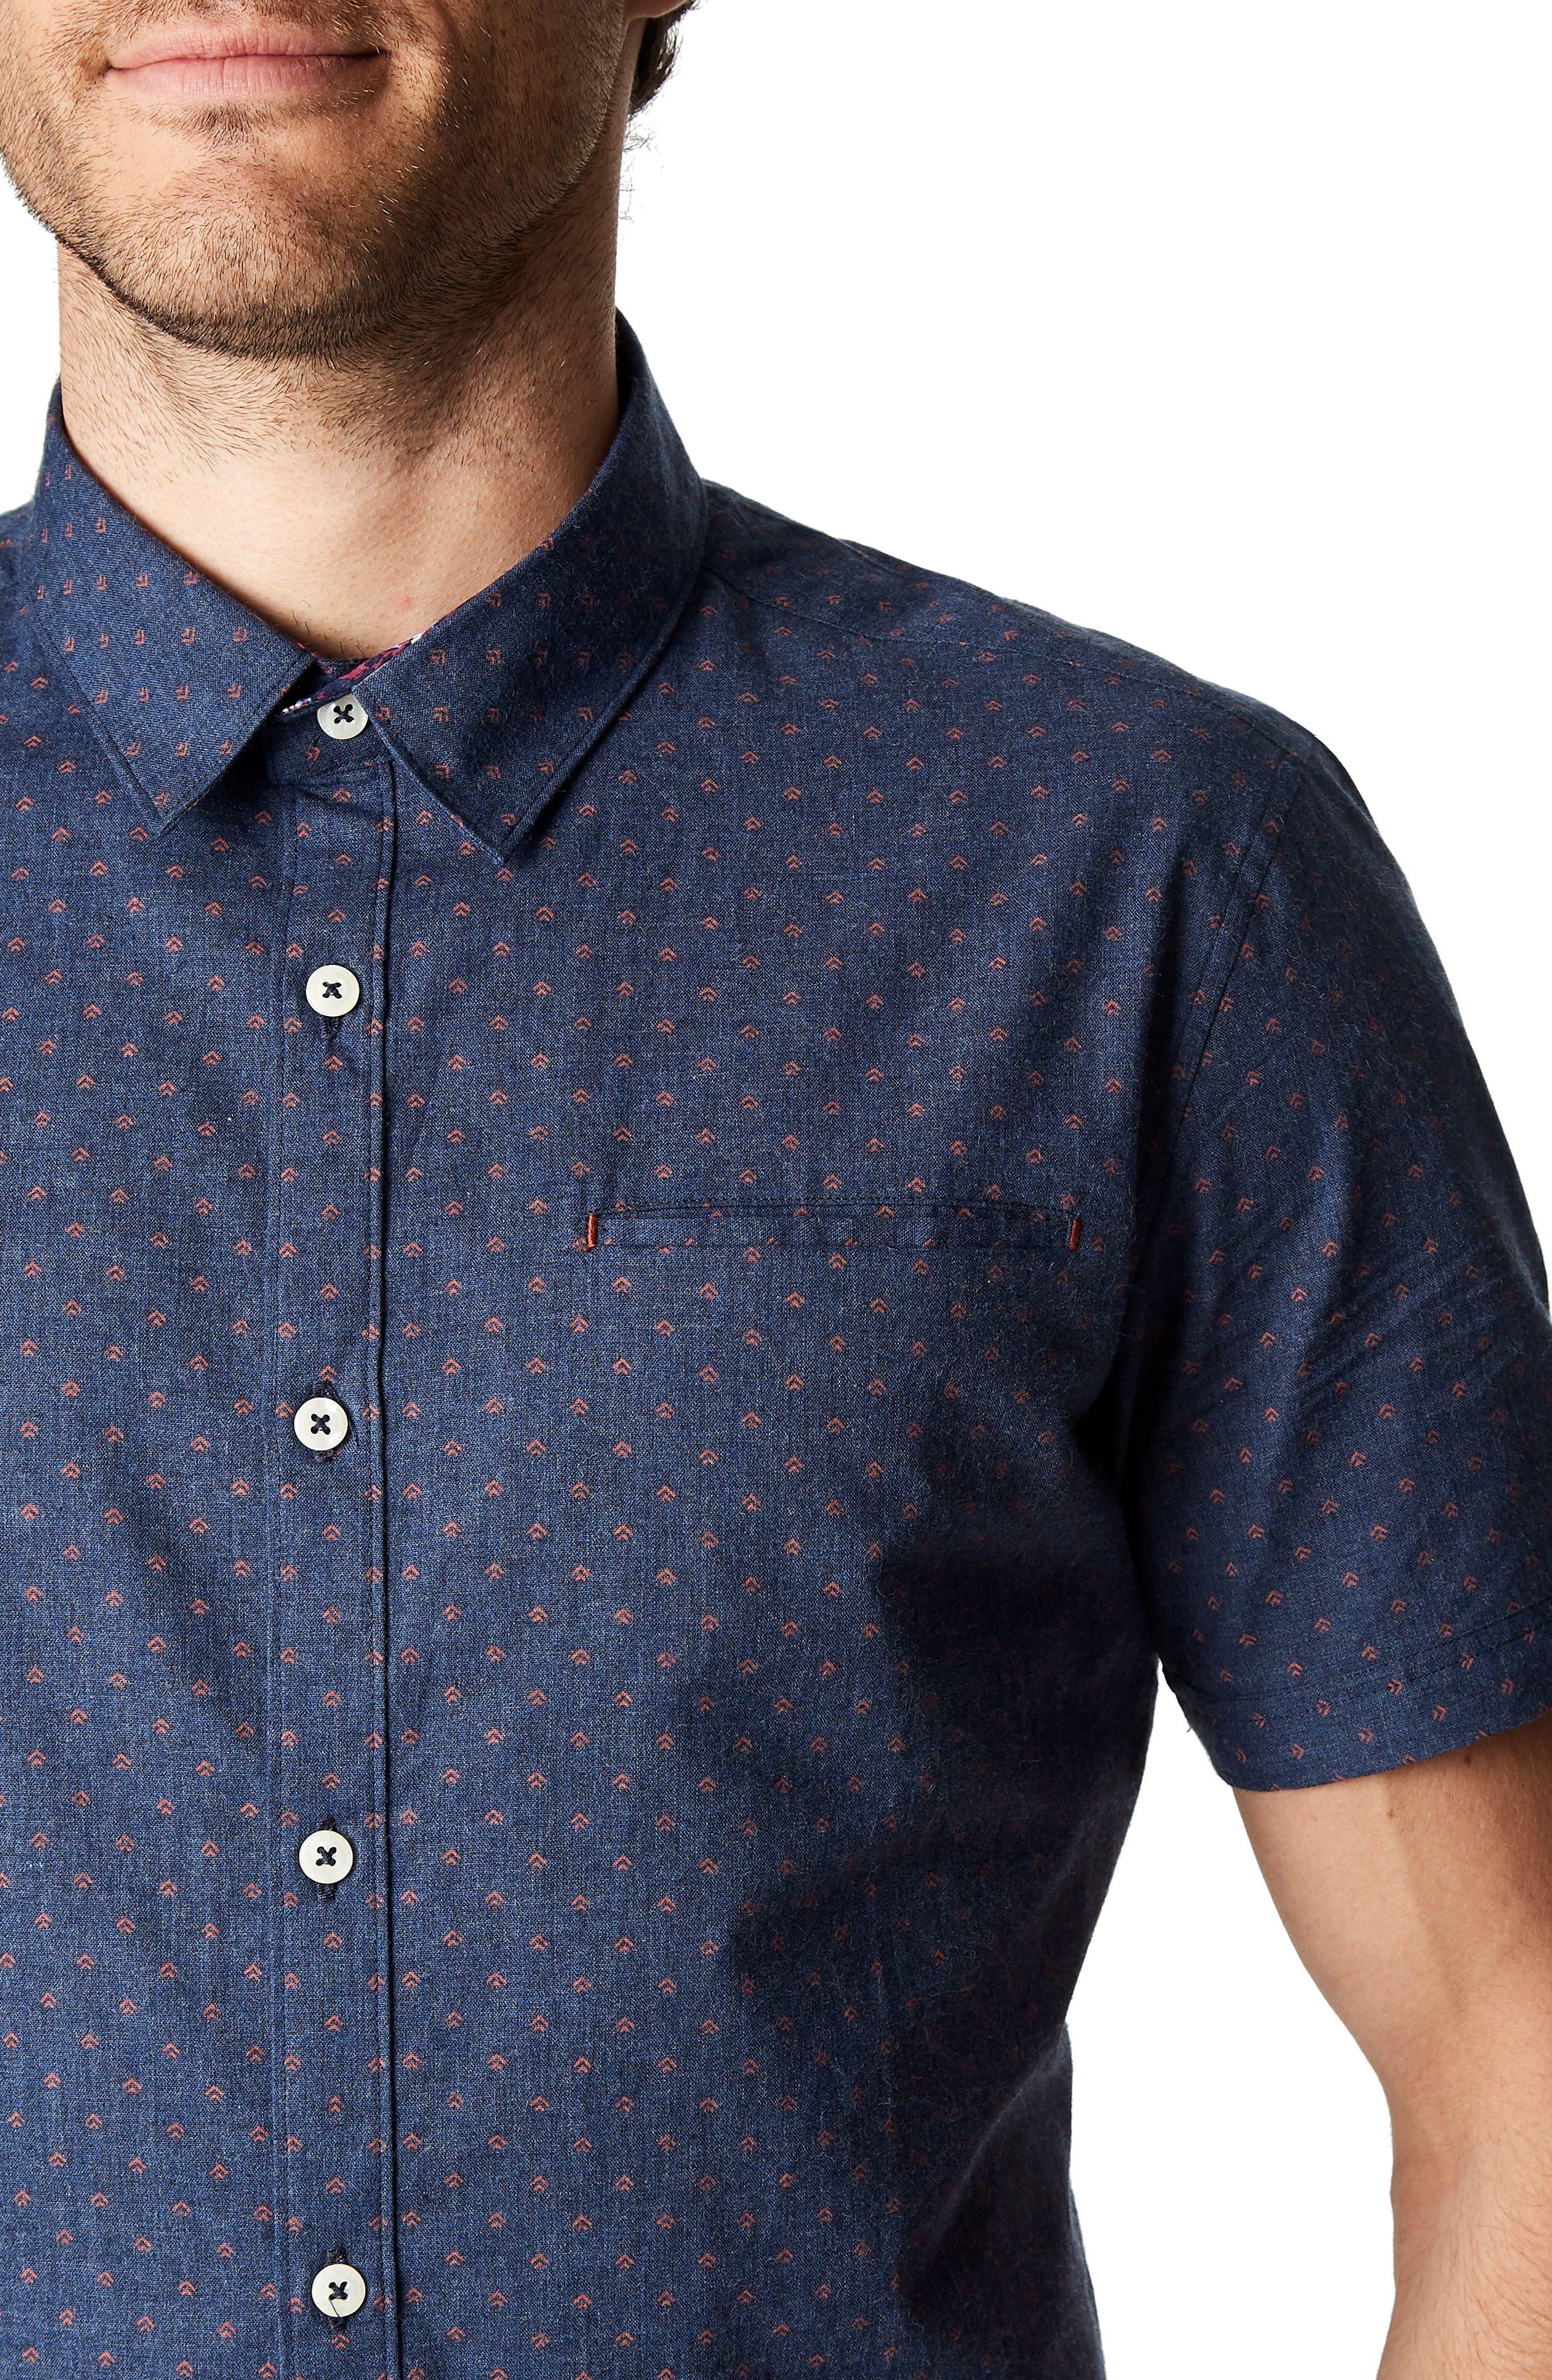 American Dream Trim Fit Sport Shirt,                             Alternate thumbnail 3, color,                             410